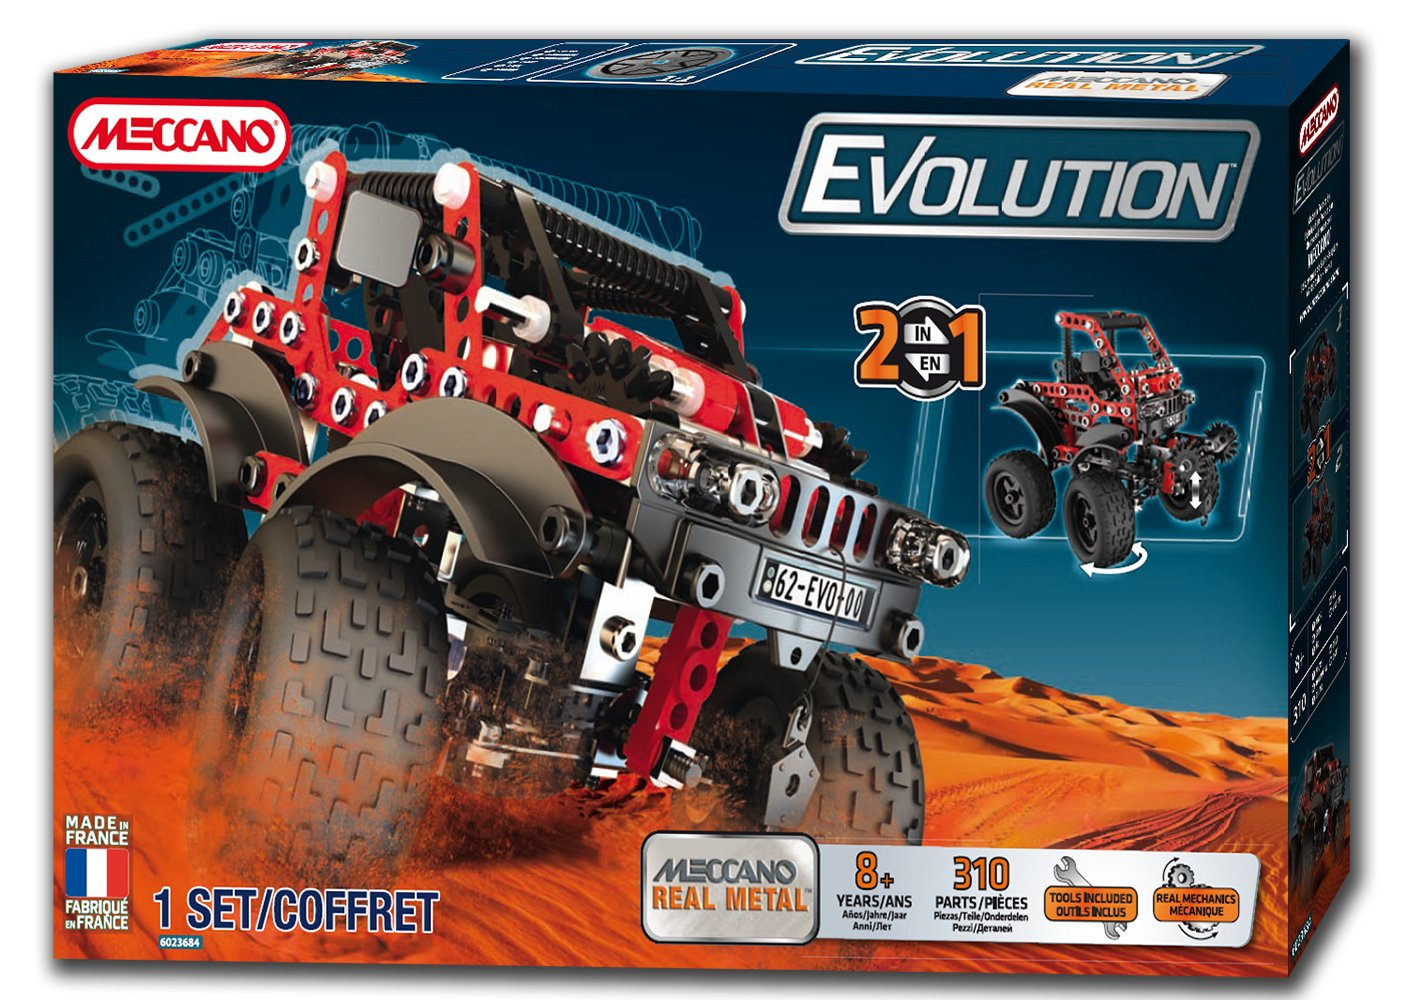 Meccano Evolution 4 x 4, Baukasten, ROT (Bizak 61921669)